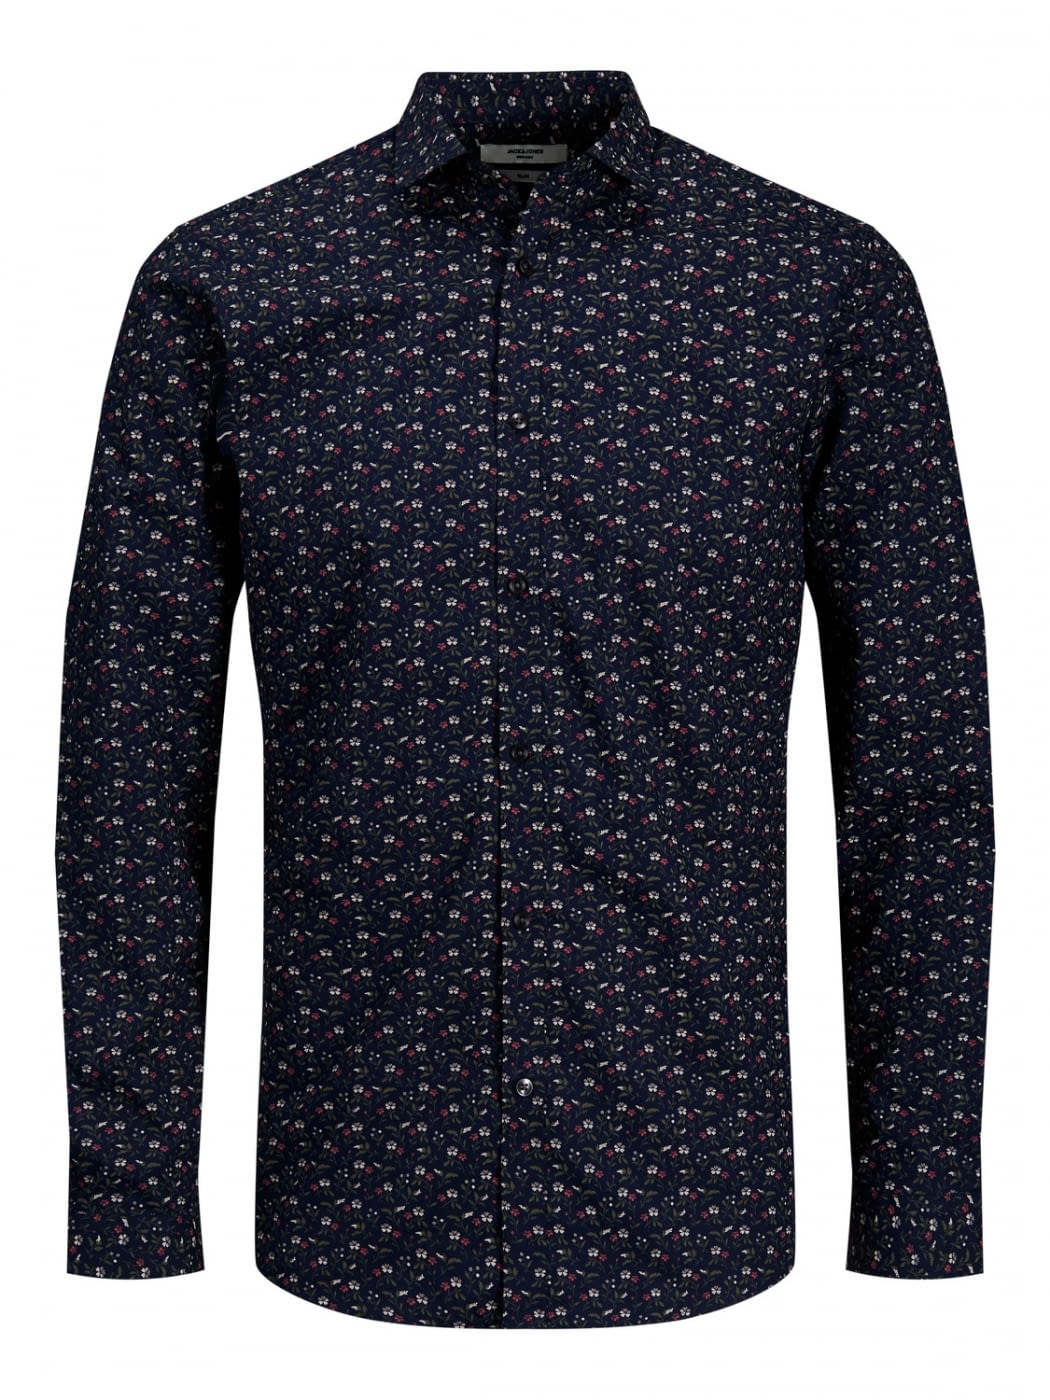 JPRBLABLACKPOOL camisa manga larga de flores